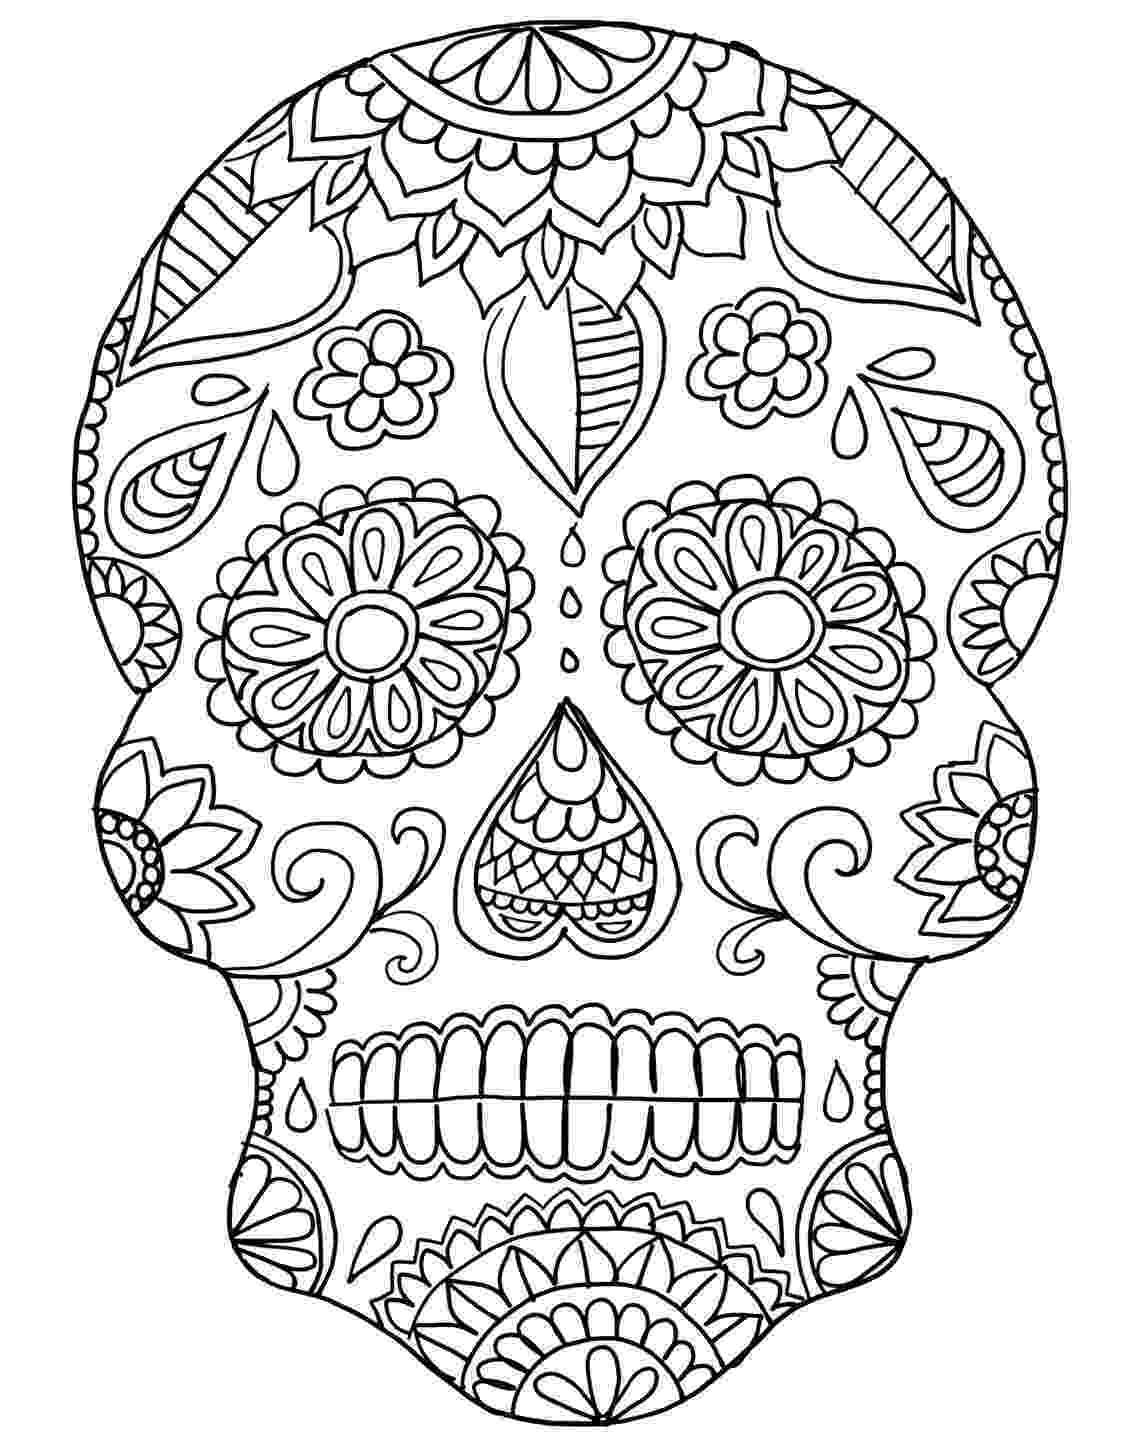 skull coloring sheet yucca flats nm wenchkin39s coloring pages girly skull skull sheet coloring